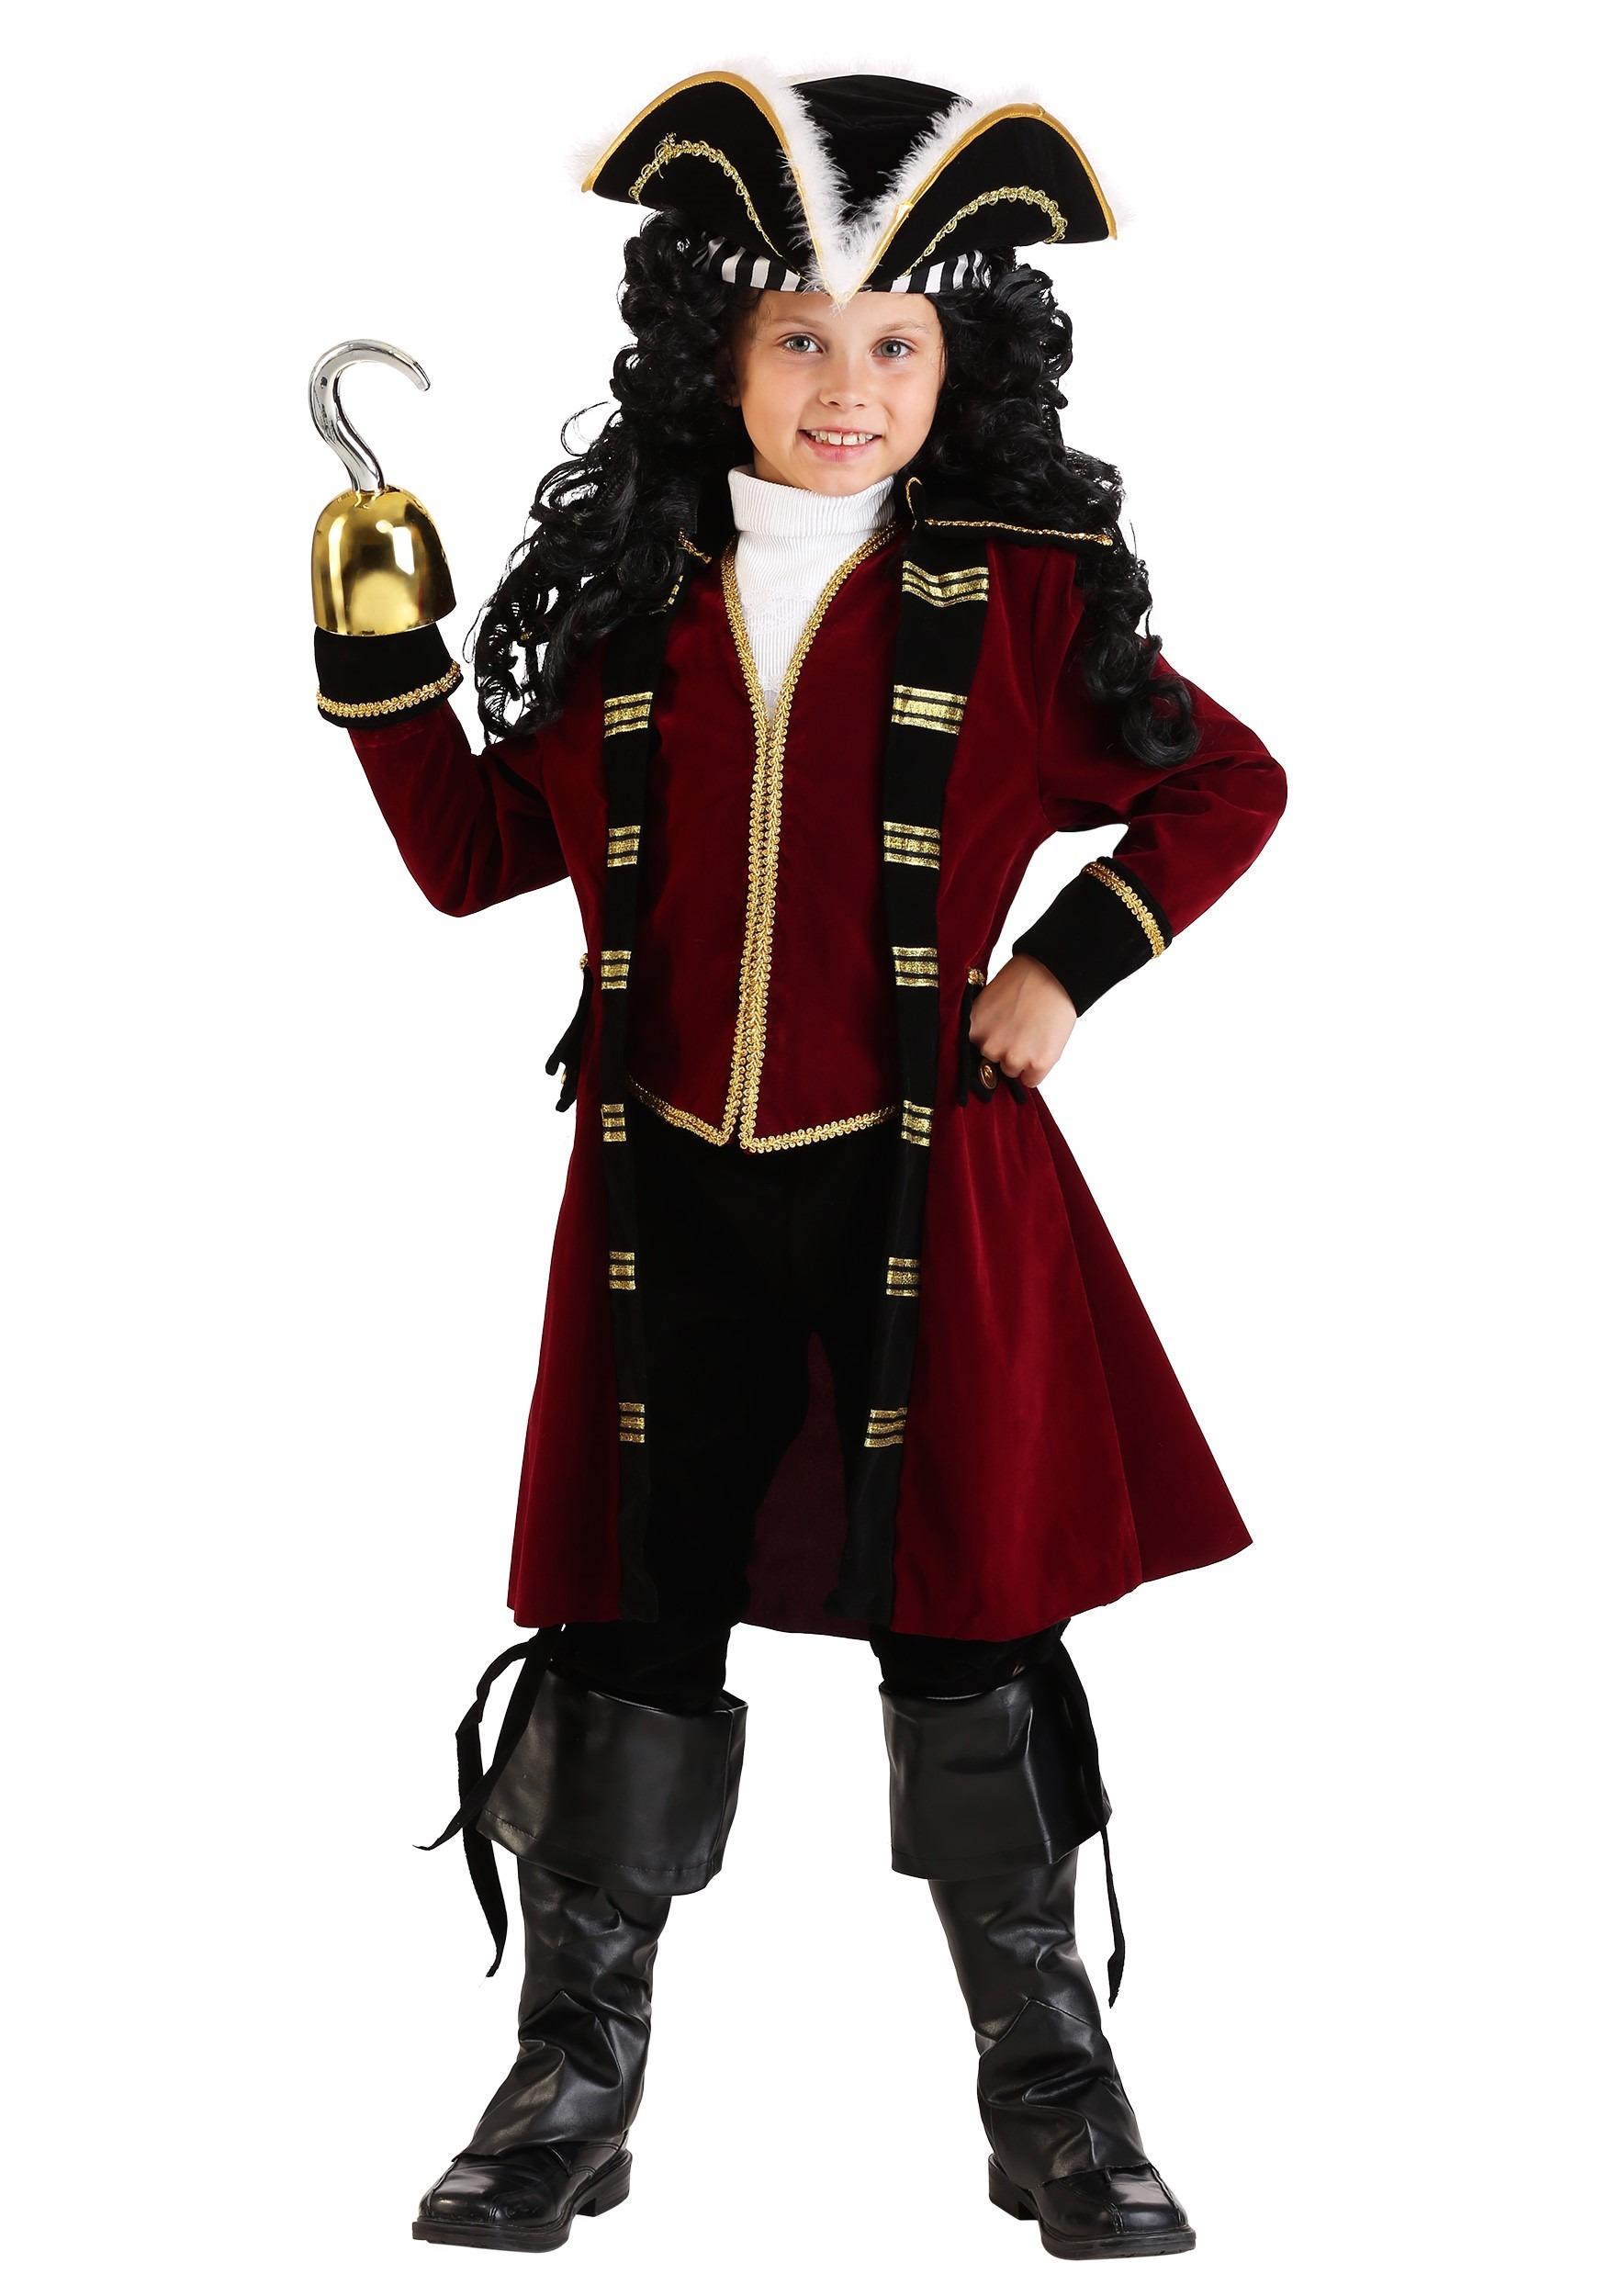 Deluxe Child Captain Hook Costume  sc 1 st  Halloween Costume & Deluxe Child Captain Hook Costume - Pirate Costumes for Kids